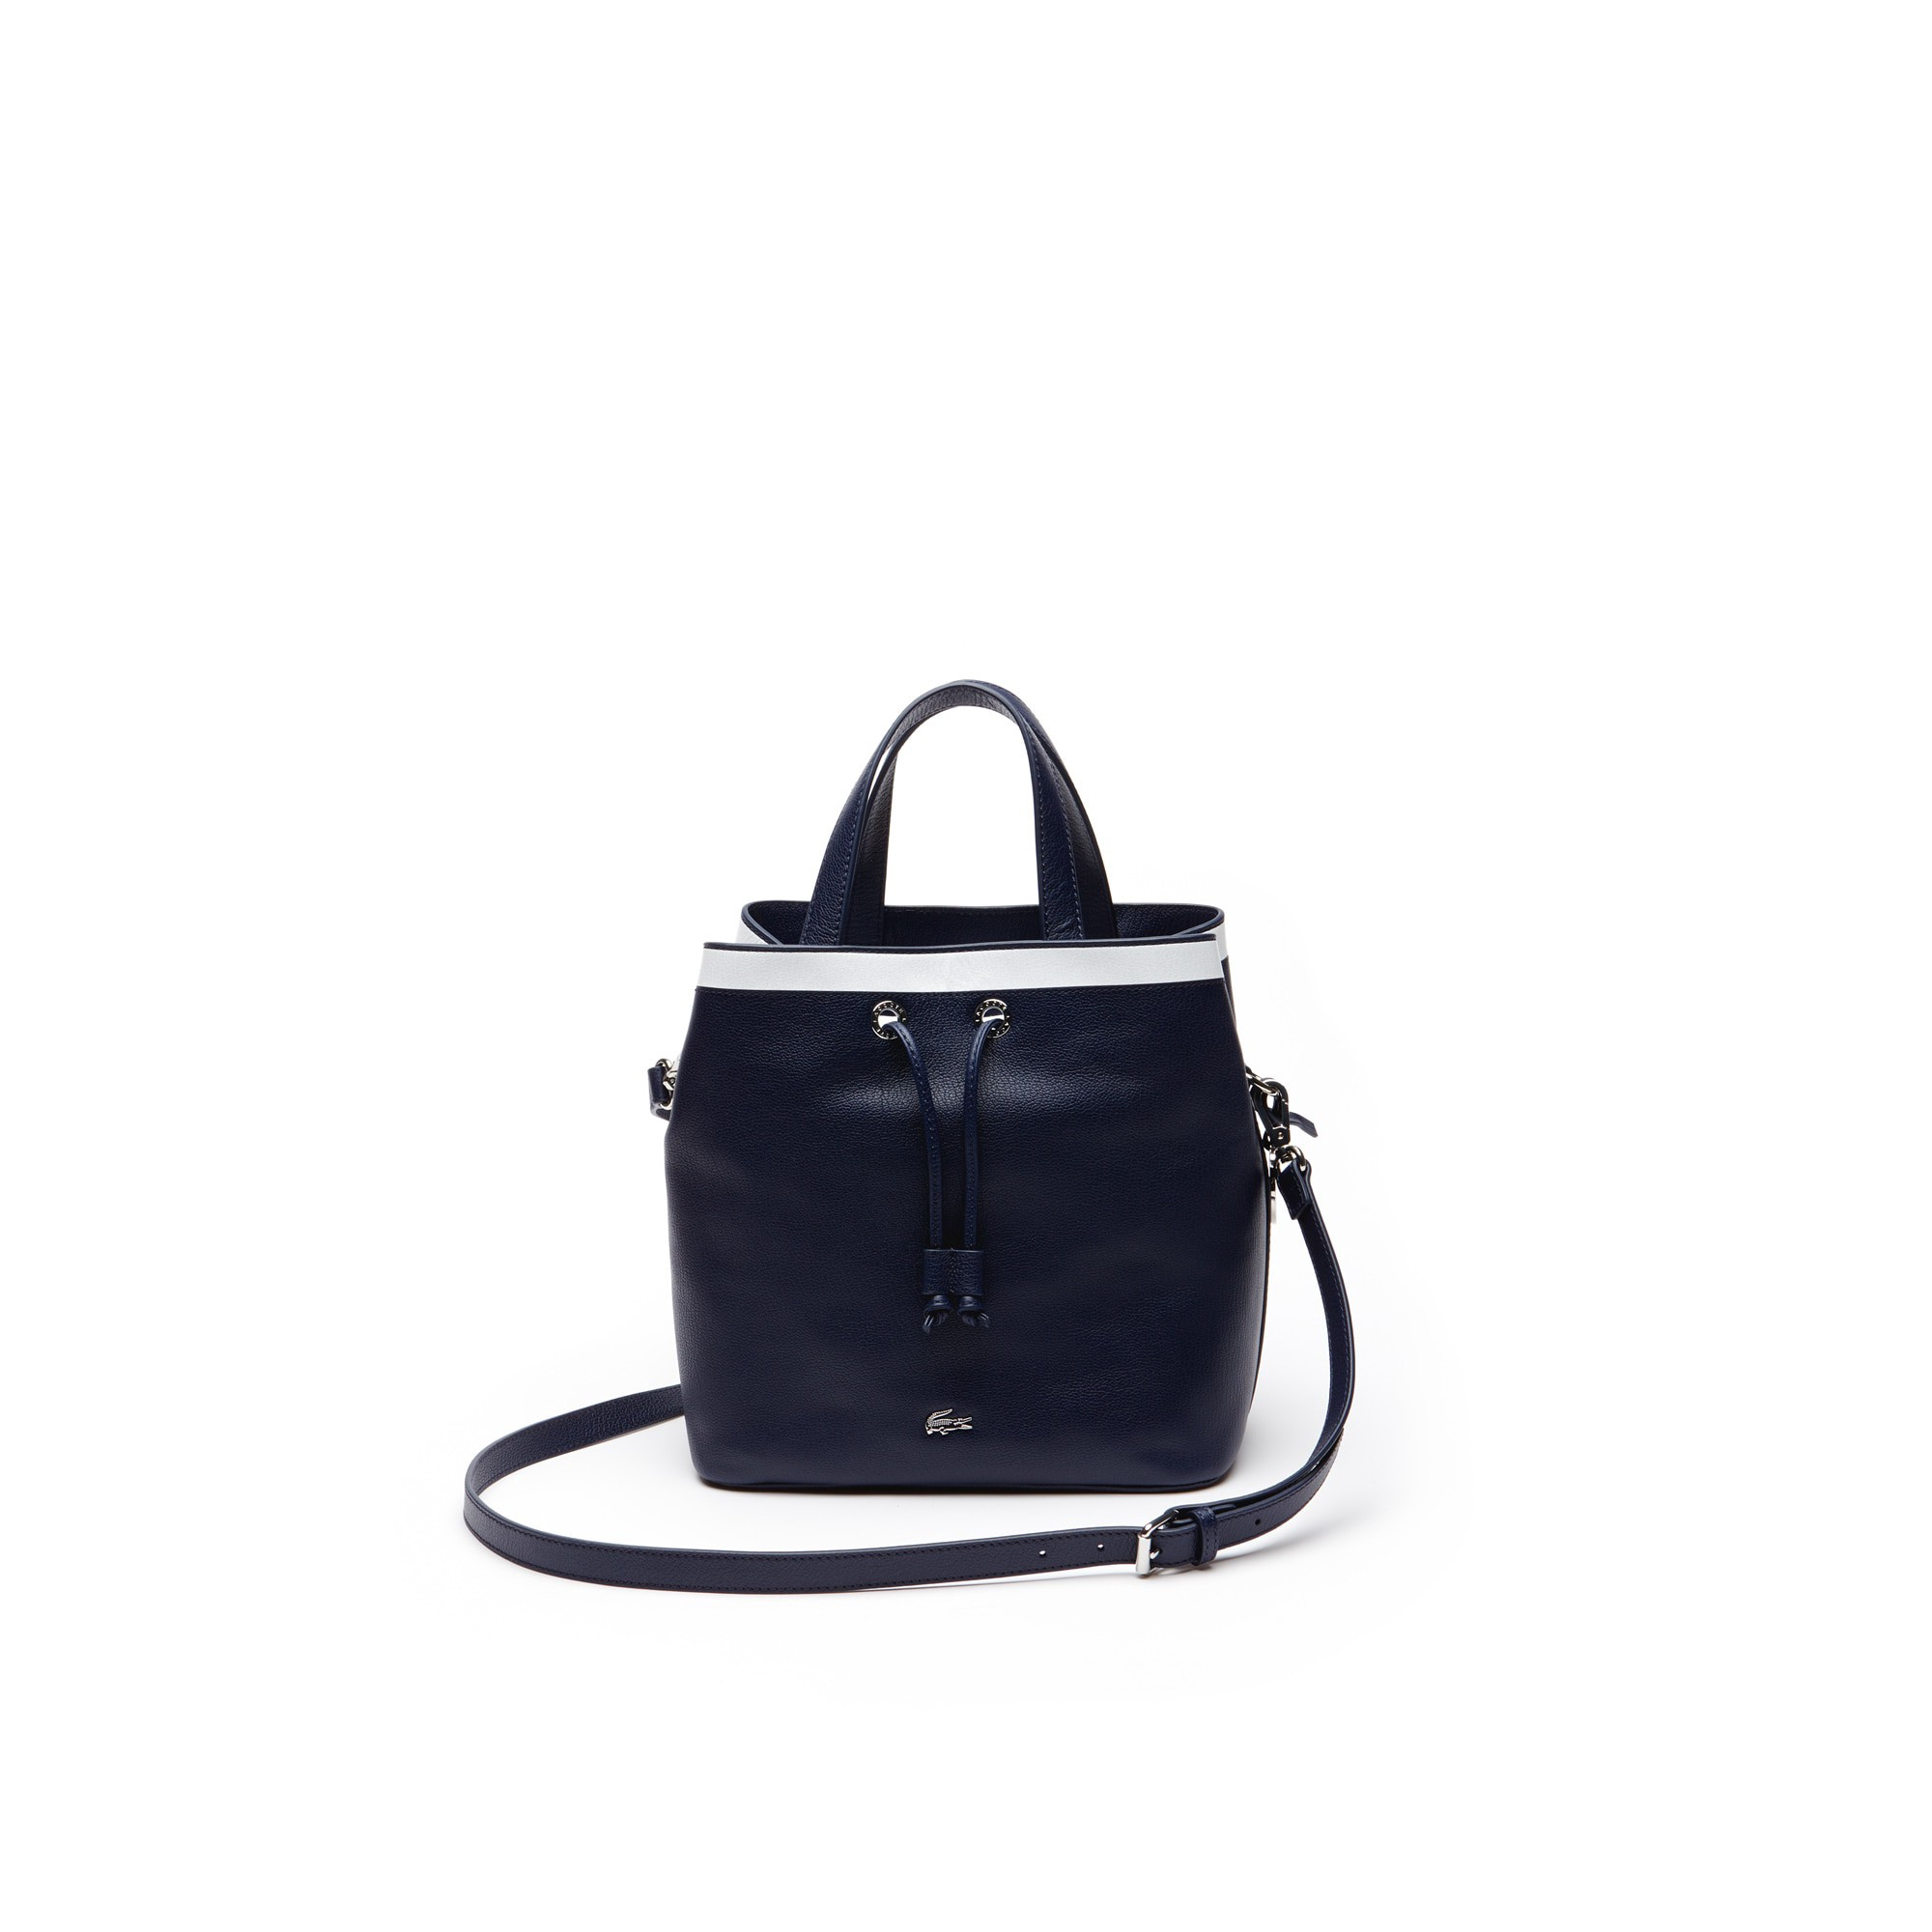 Lacoste Women S Break Point Colorblock Leather Bucket Bag - Peacoat White 2809c6033